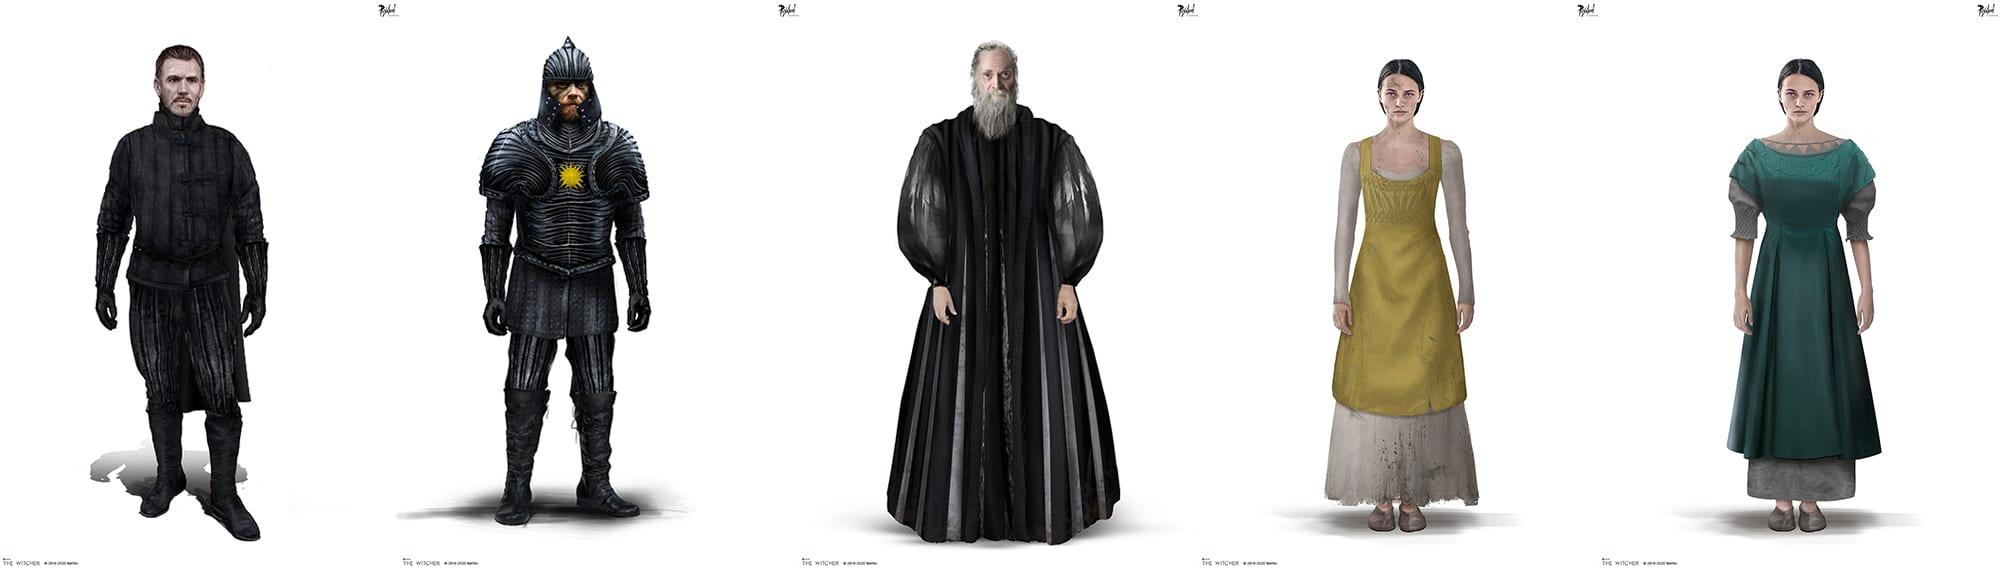 The Witcher Netflix Kostüme